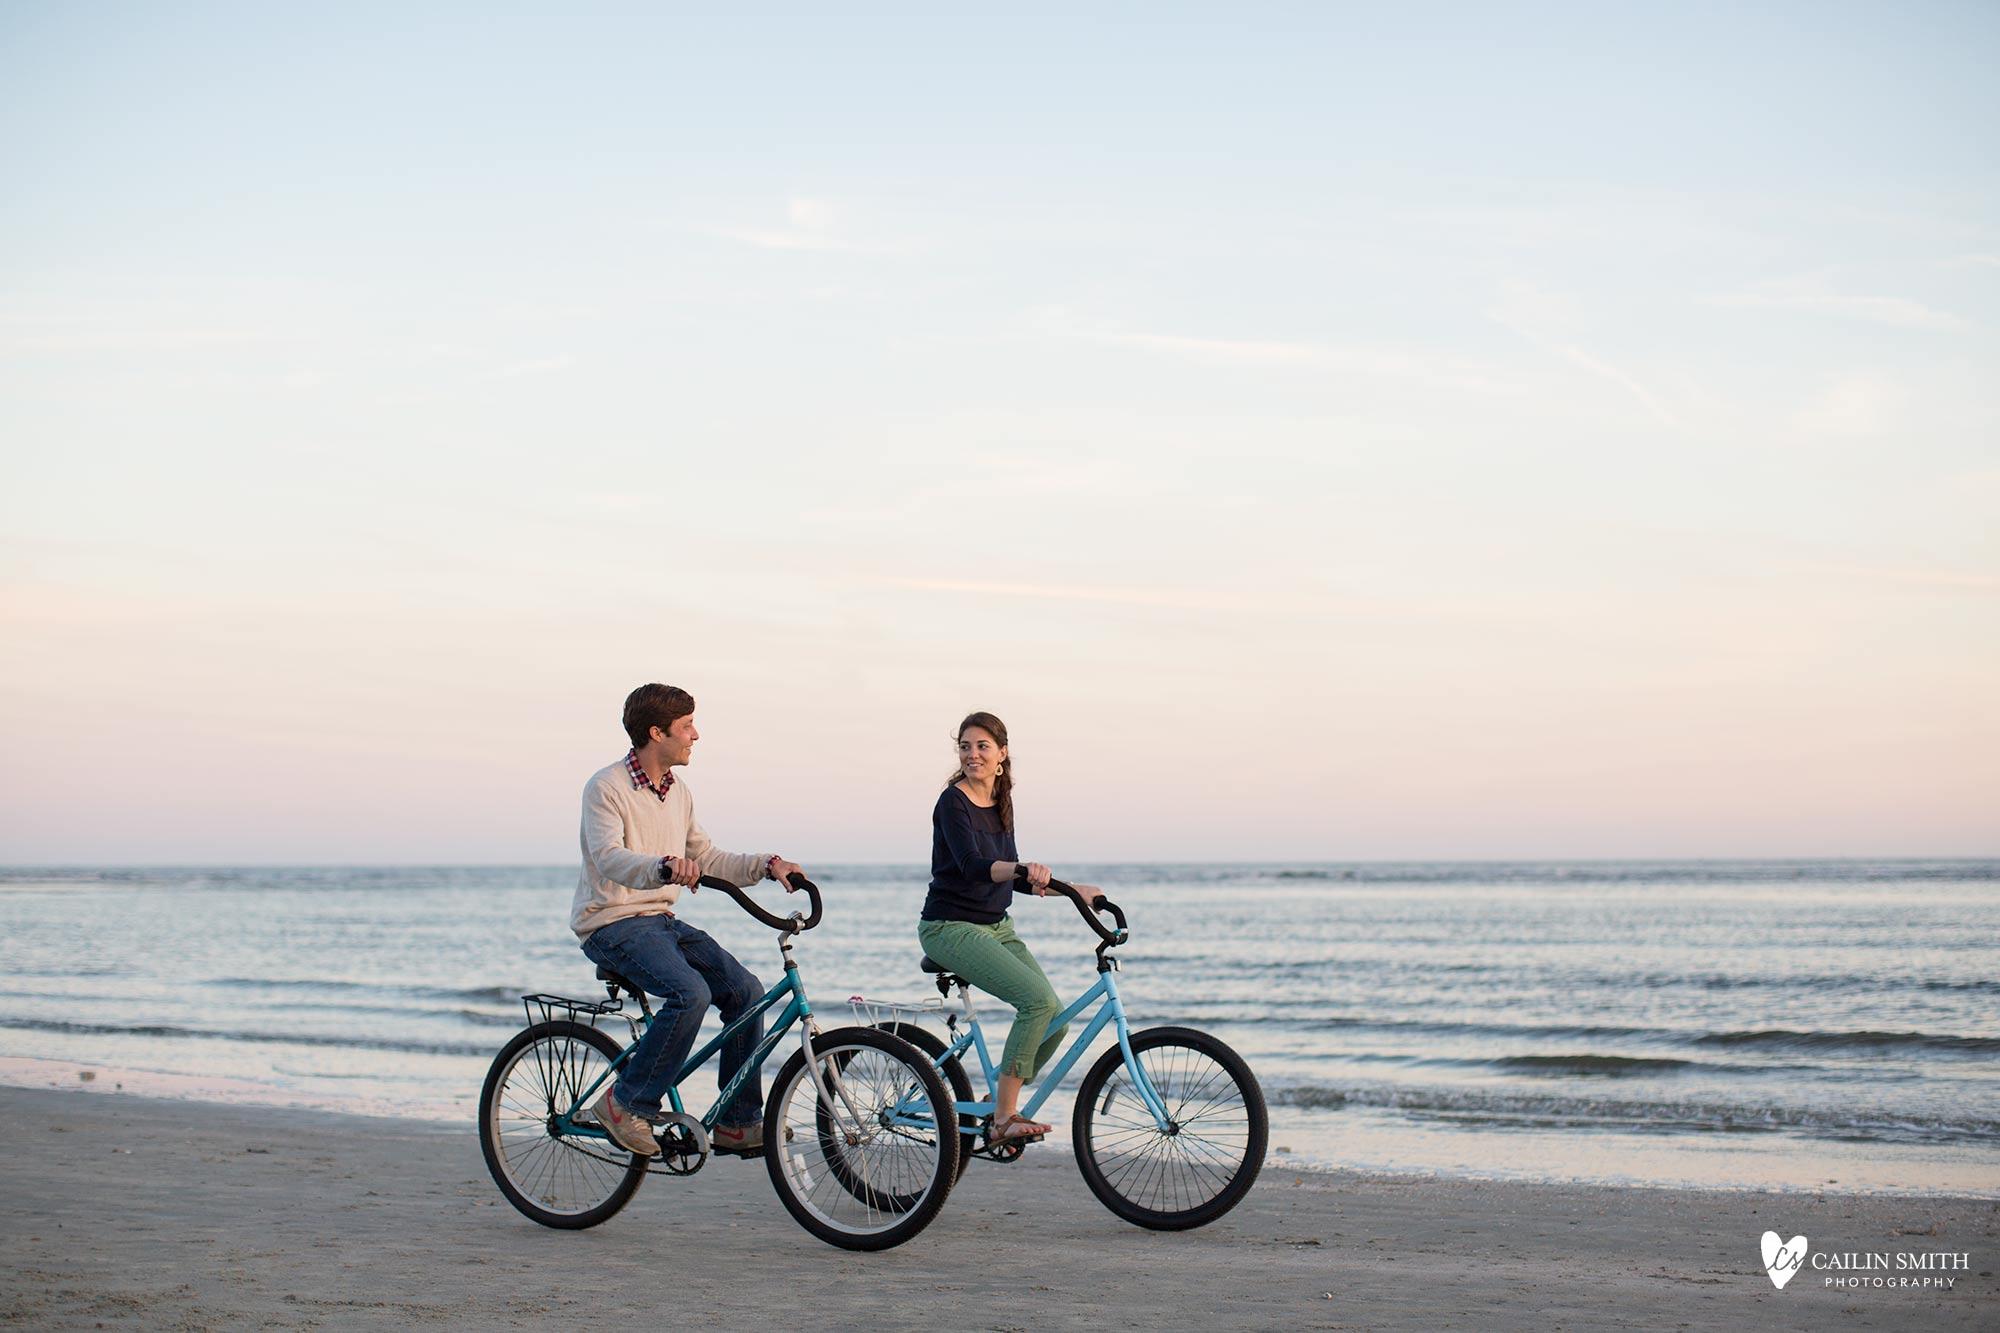 Saint_Simons_Island_Bicycle_Engagement_Photography_017